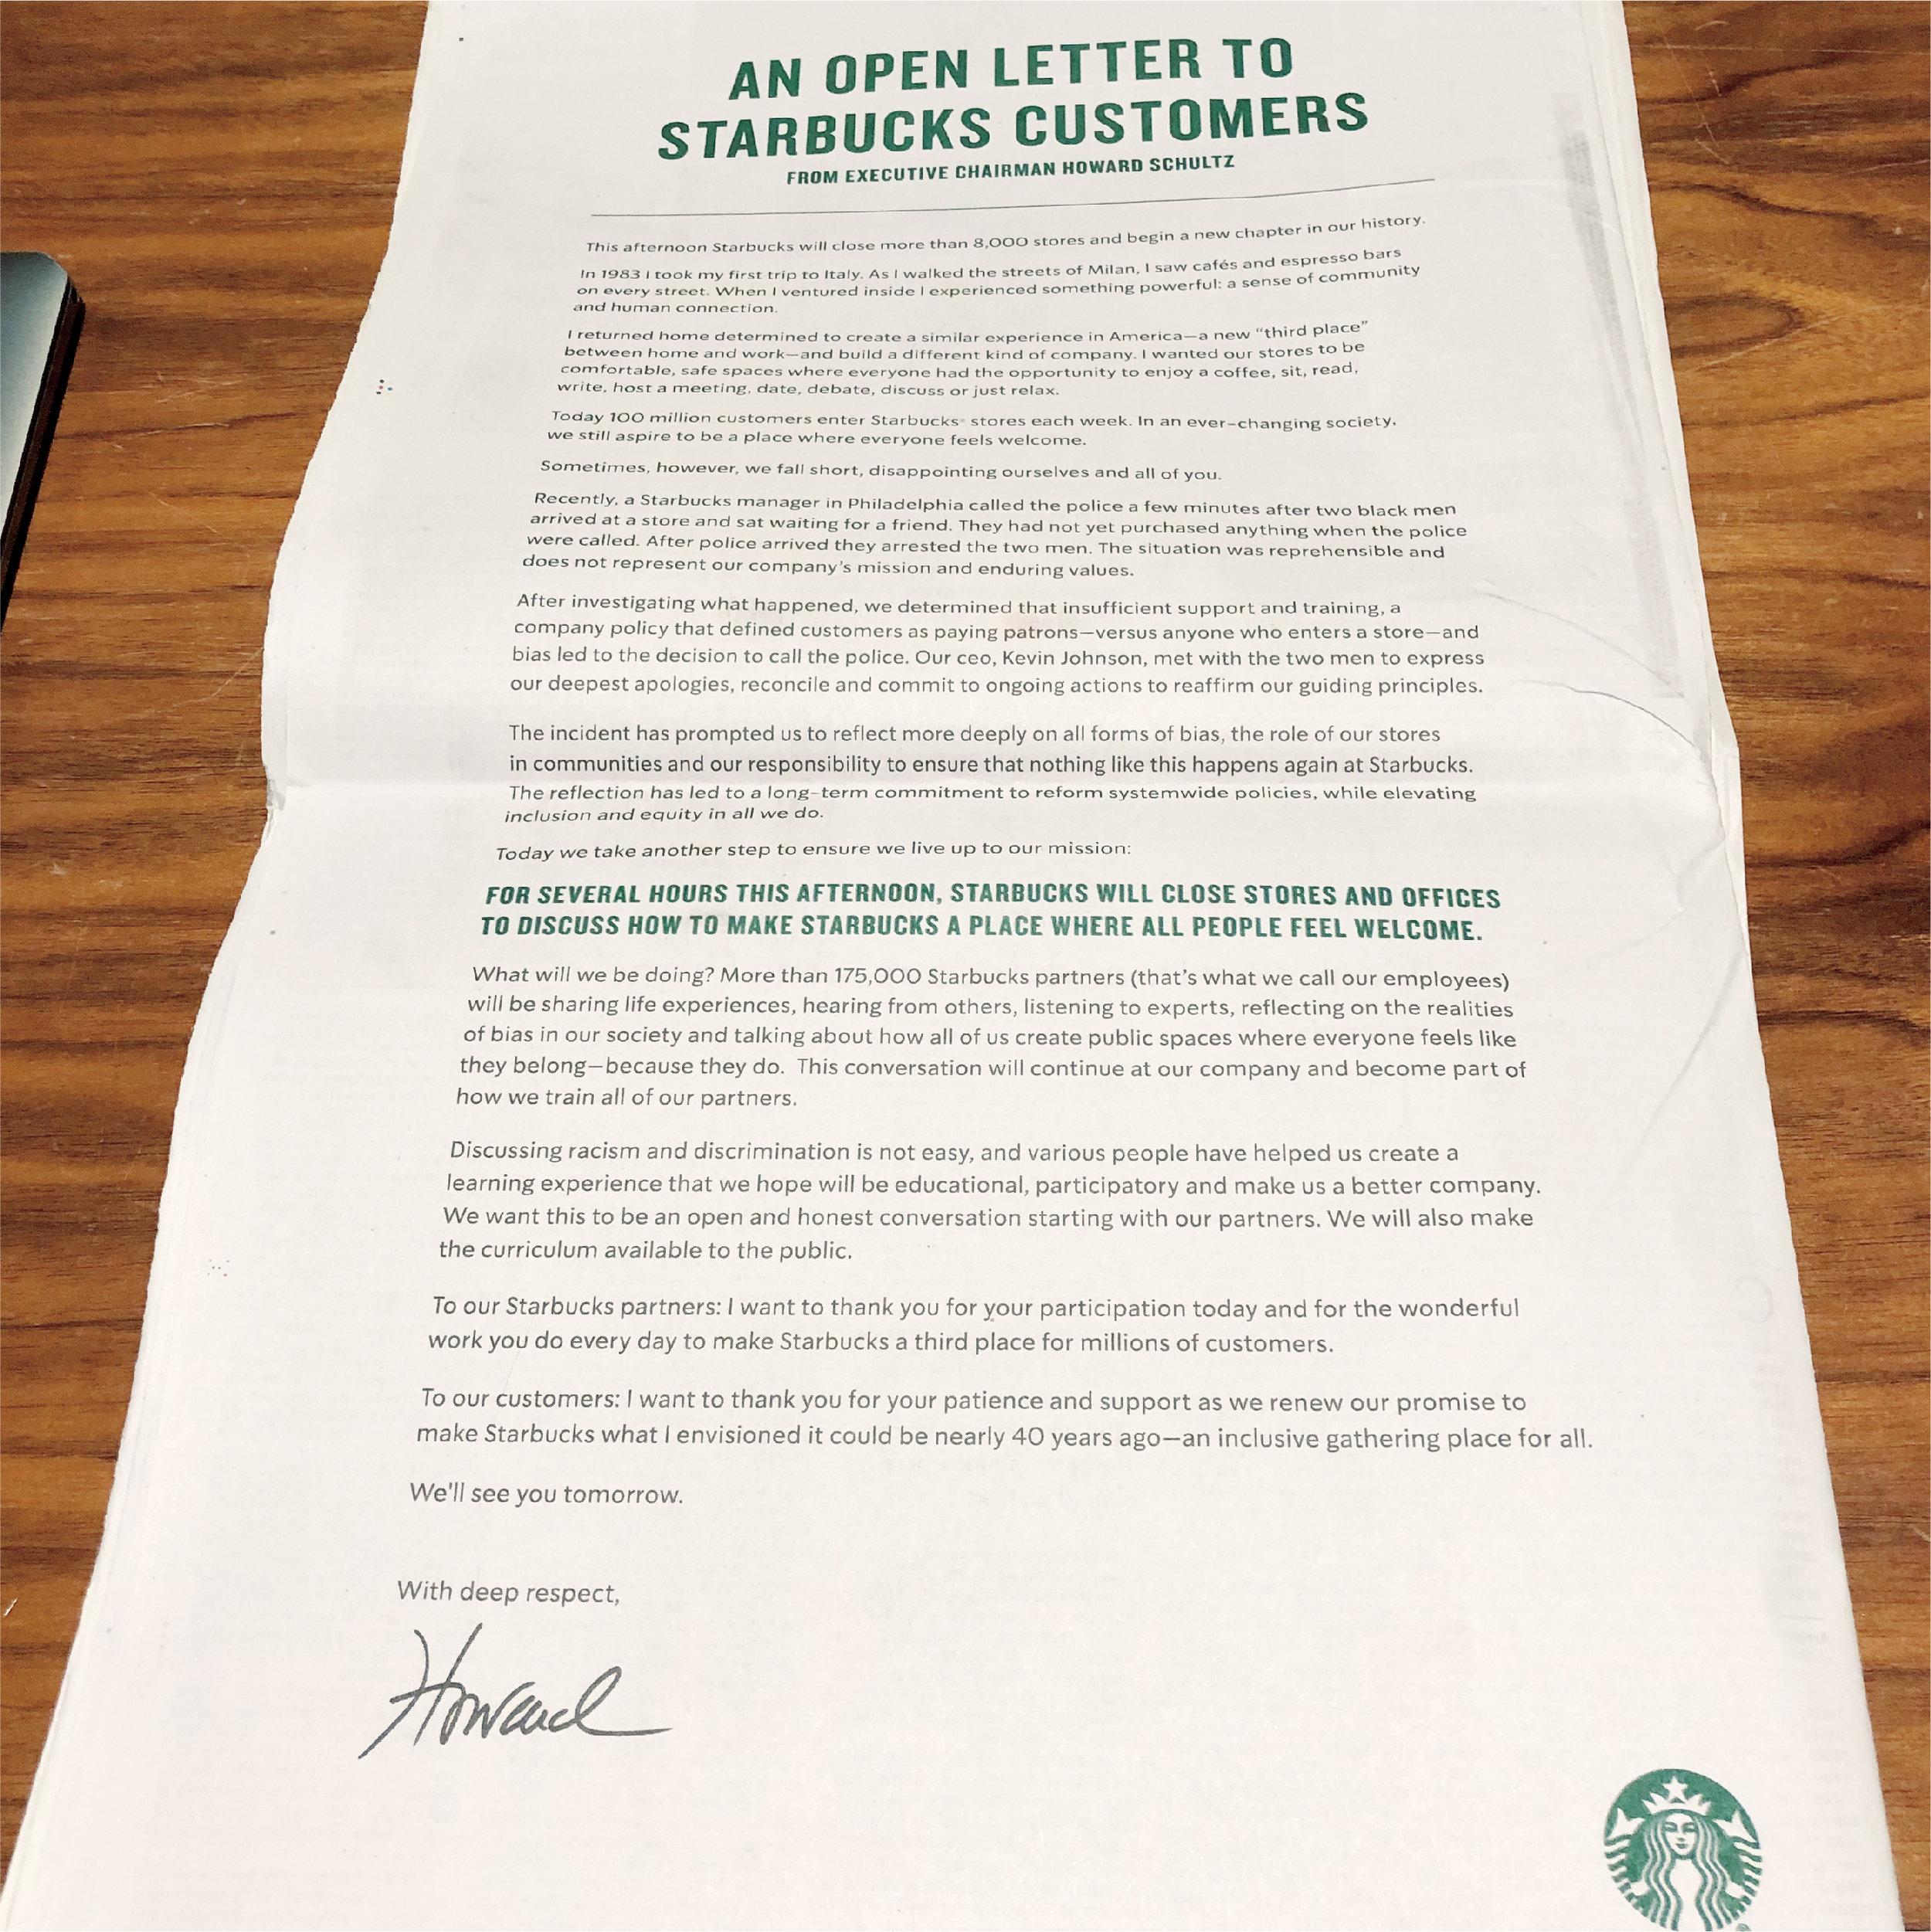 Penny_Lorber_Starbucks_24.jpg